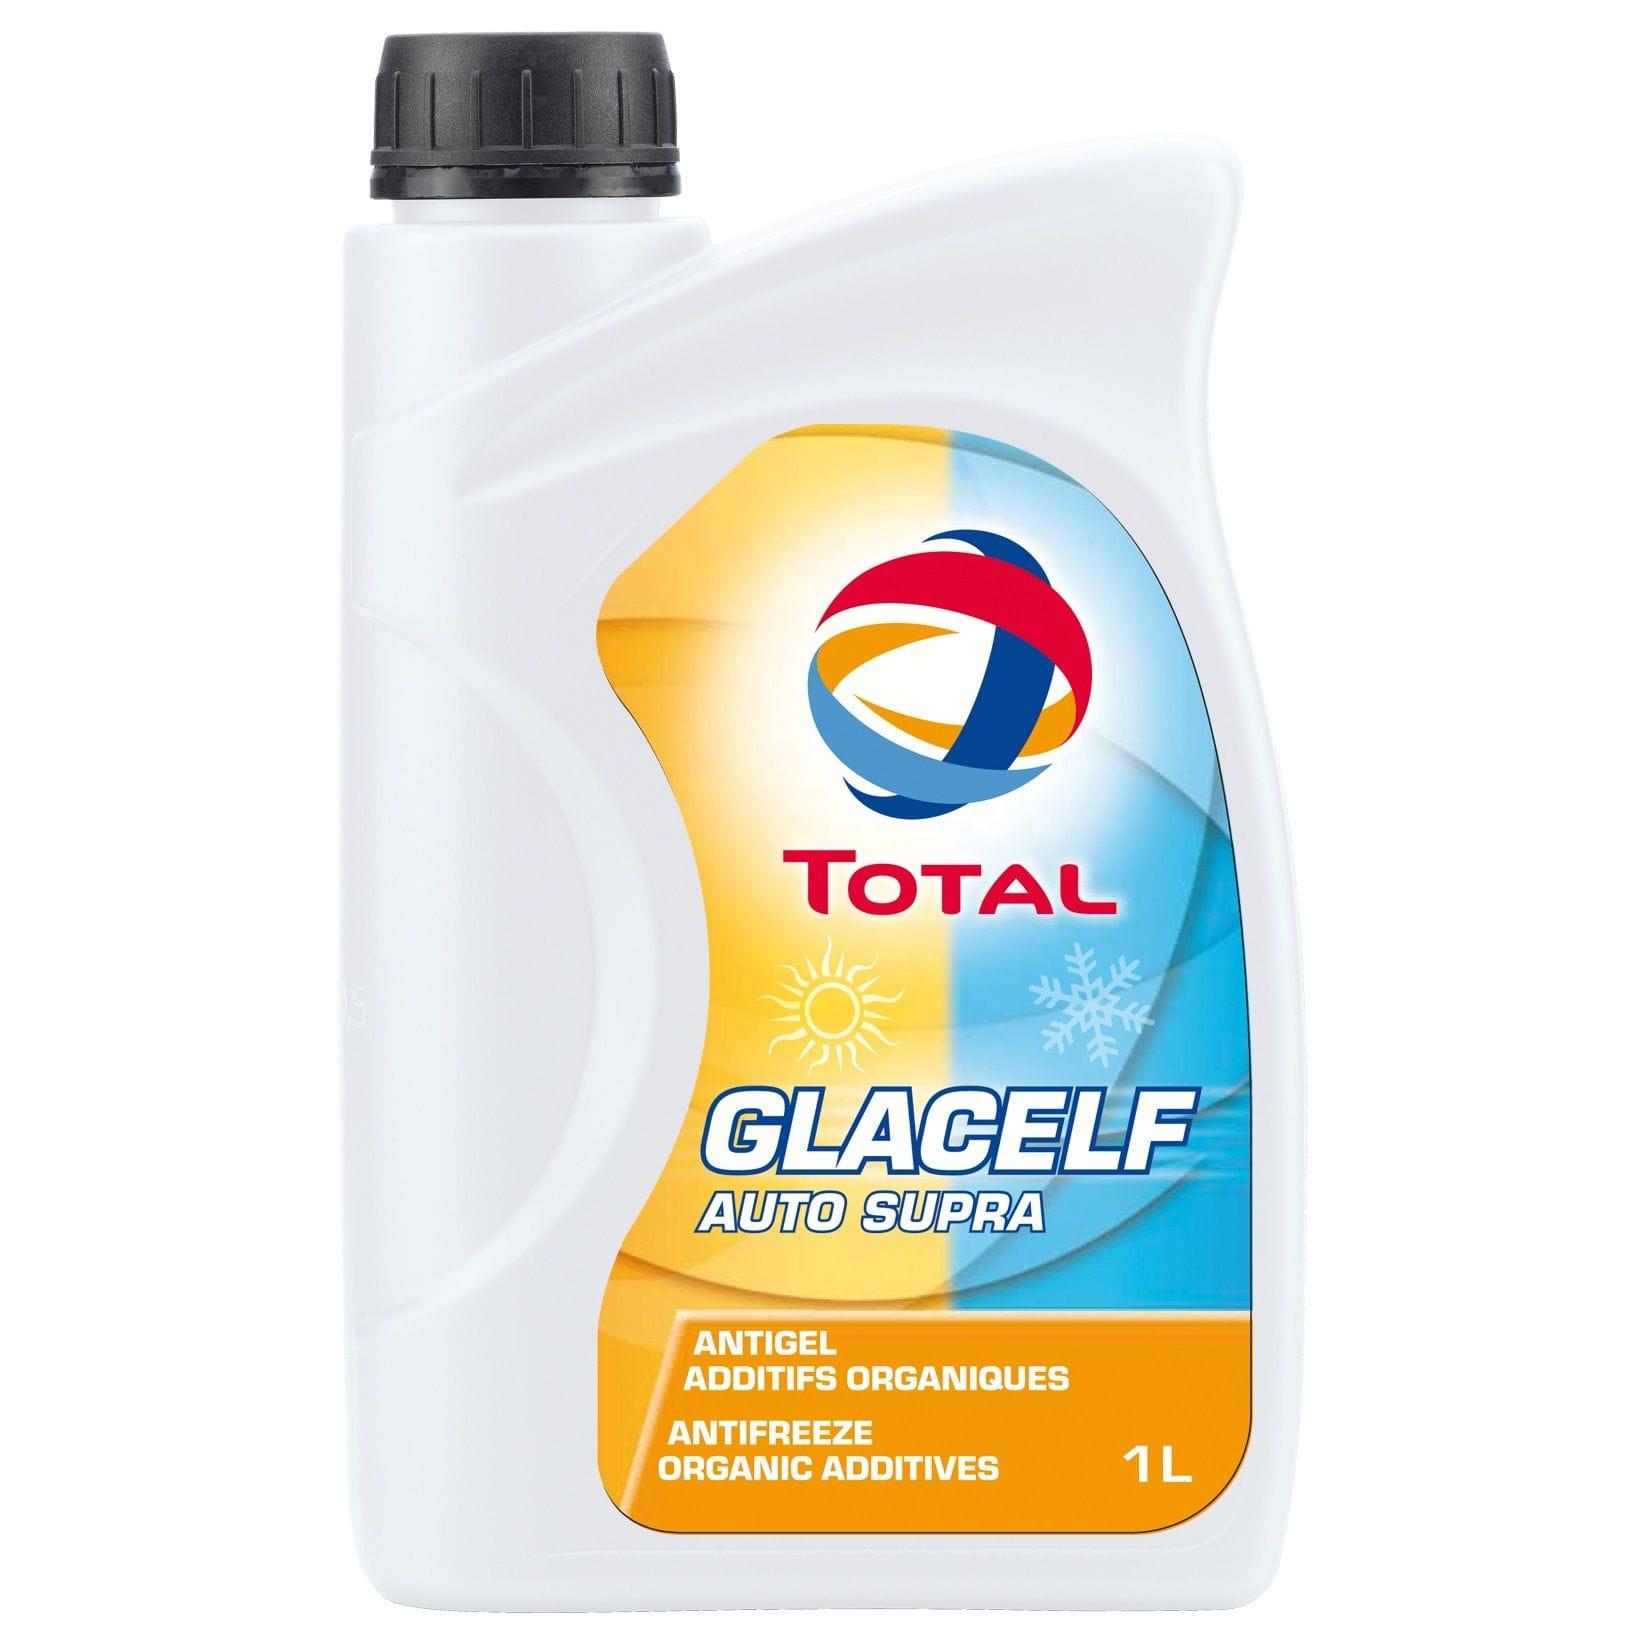 Antigel Total Glacelf Auto Supra 1L